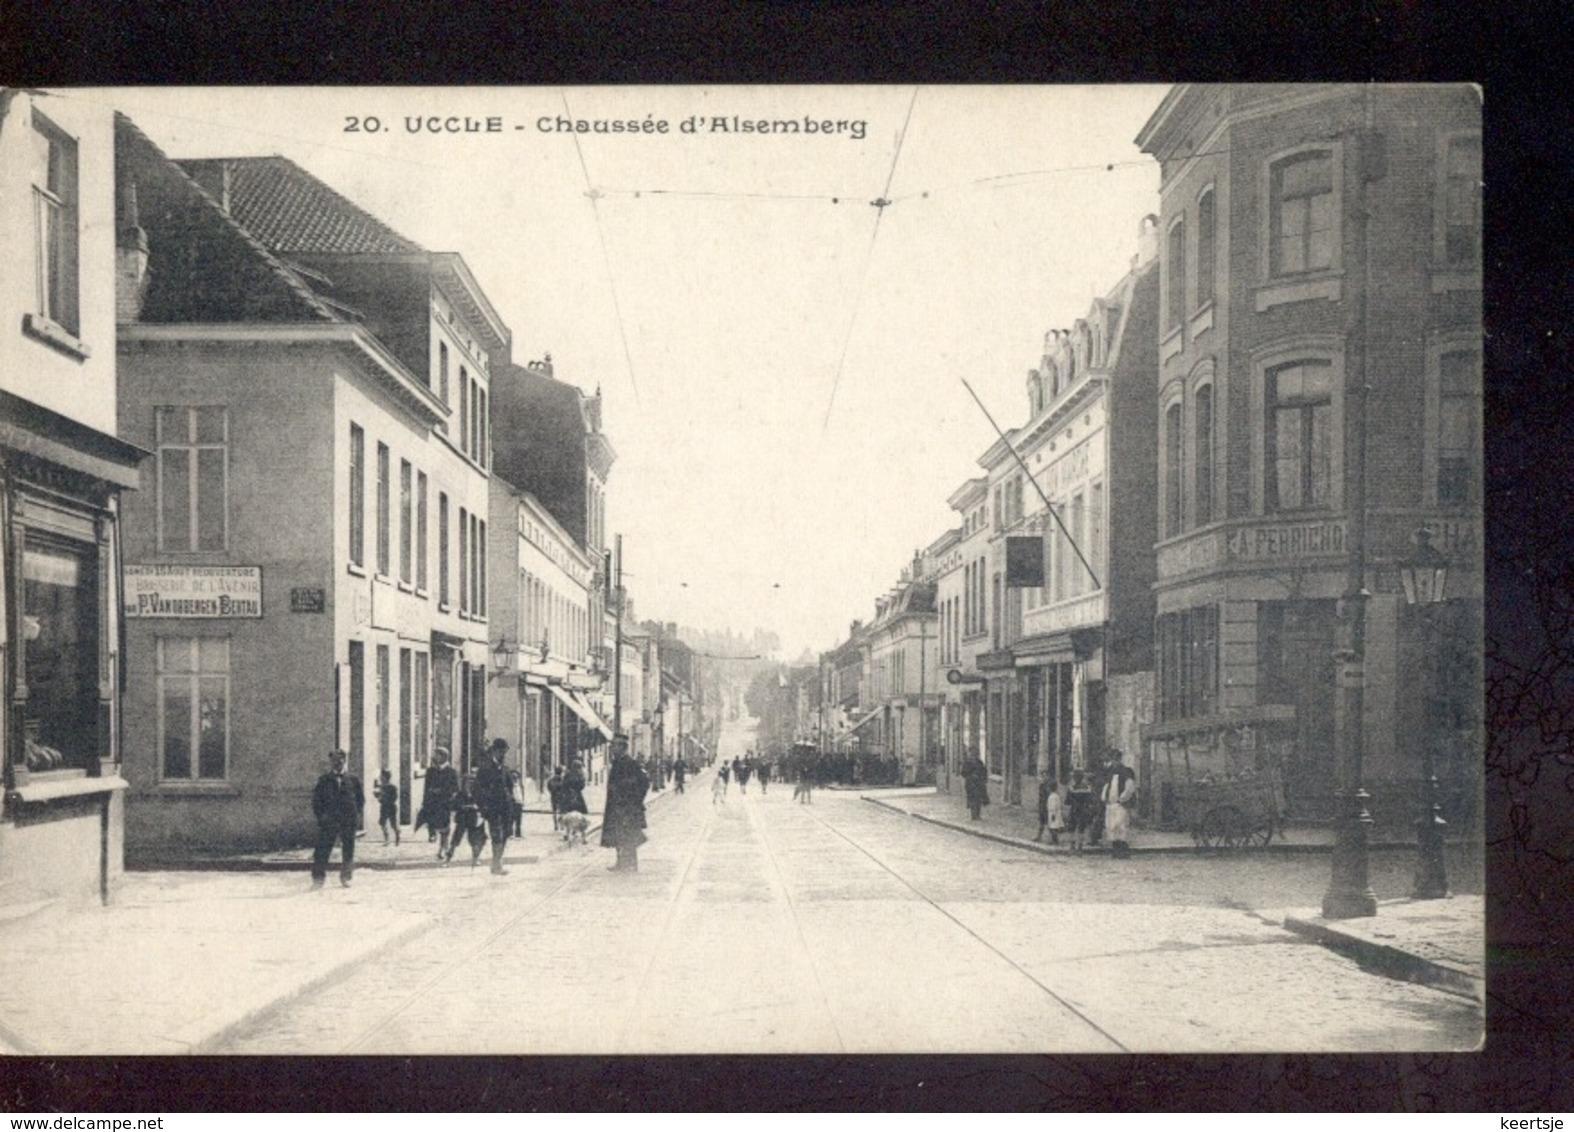 Uccle - Chaussee D Alsemberg - A Perricho - 1909 - Belgique